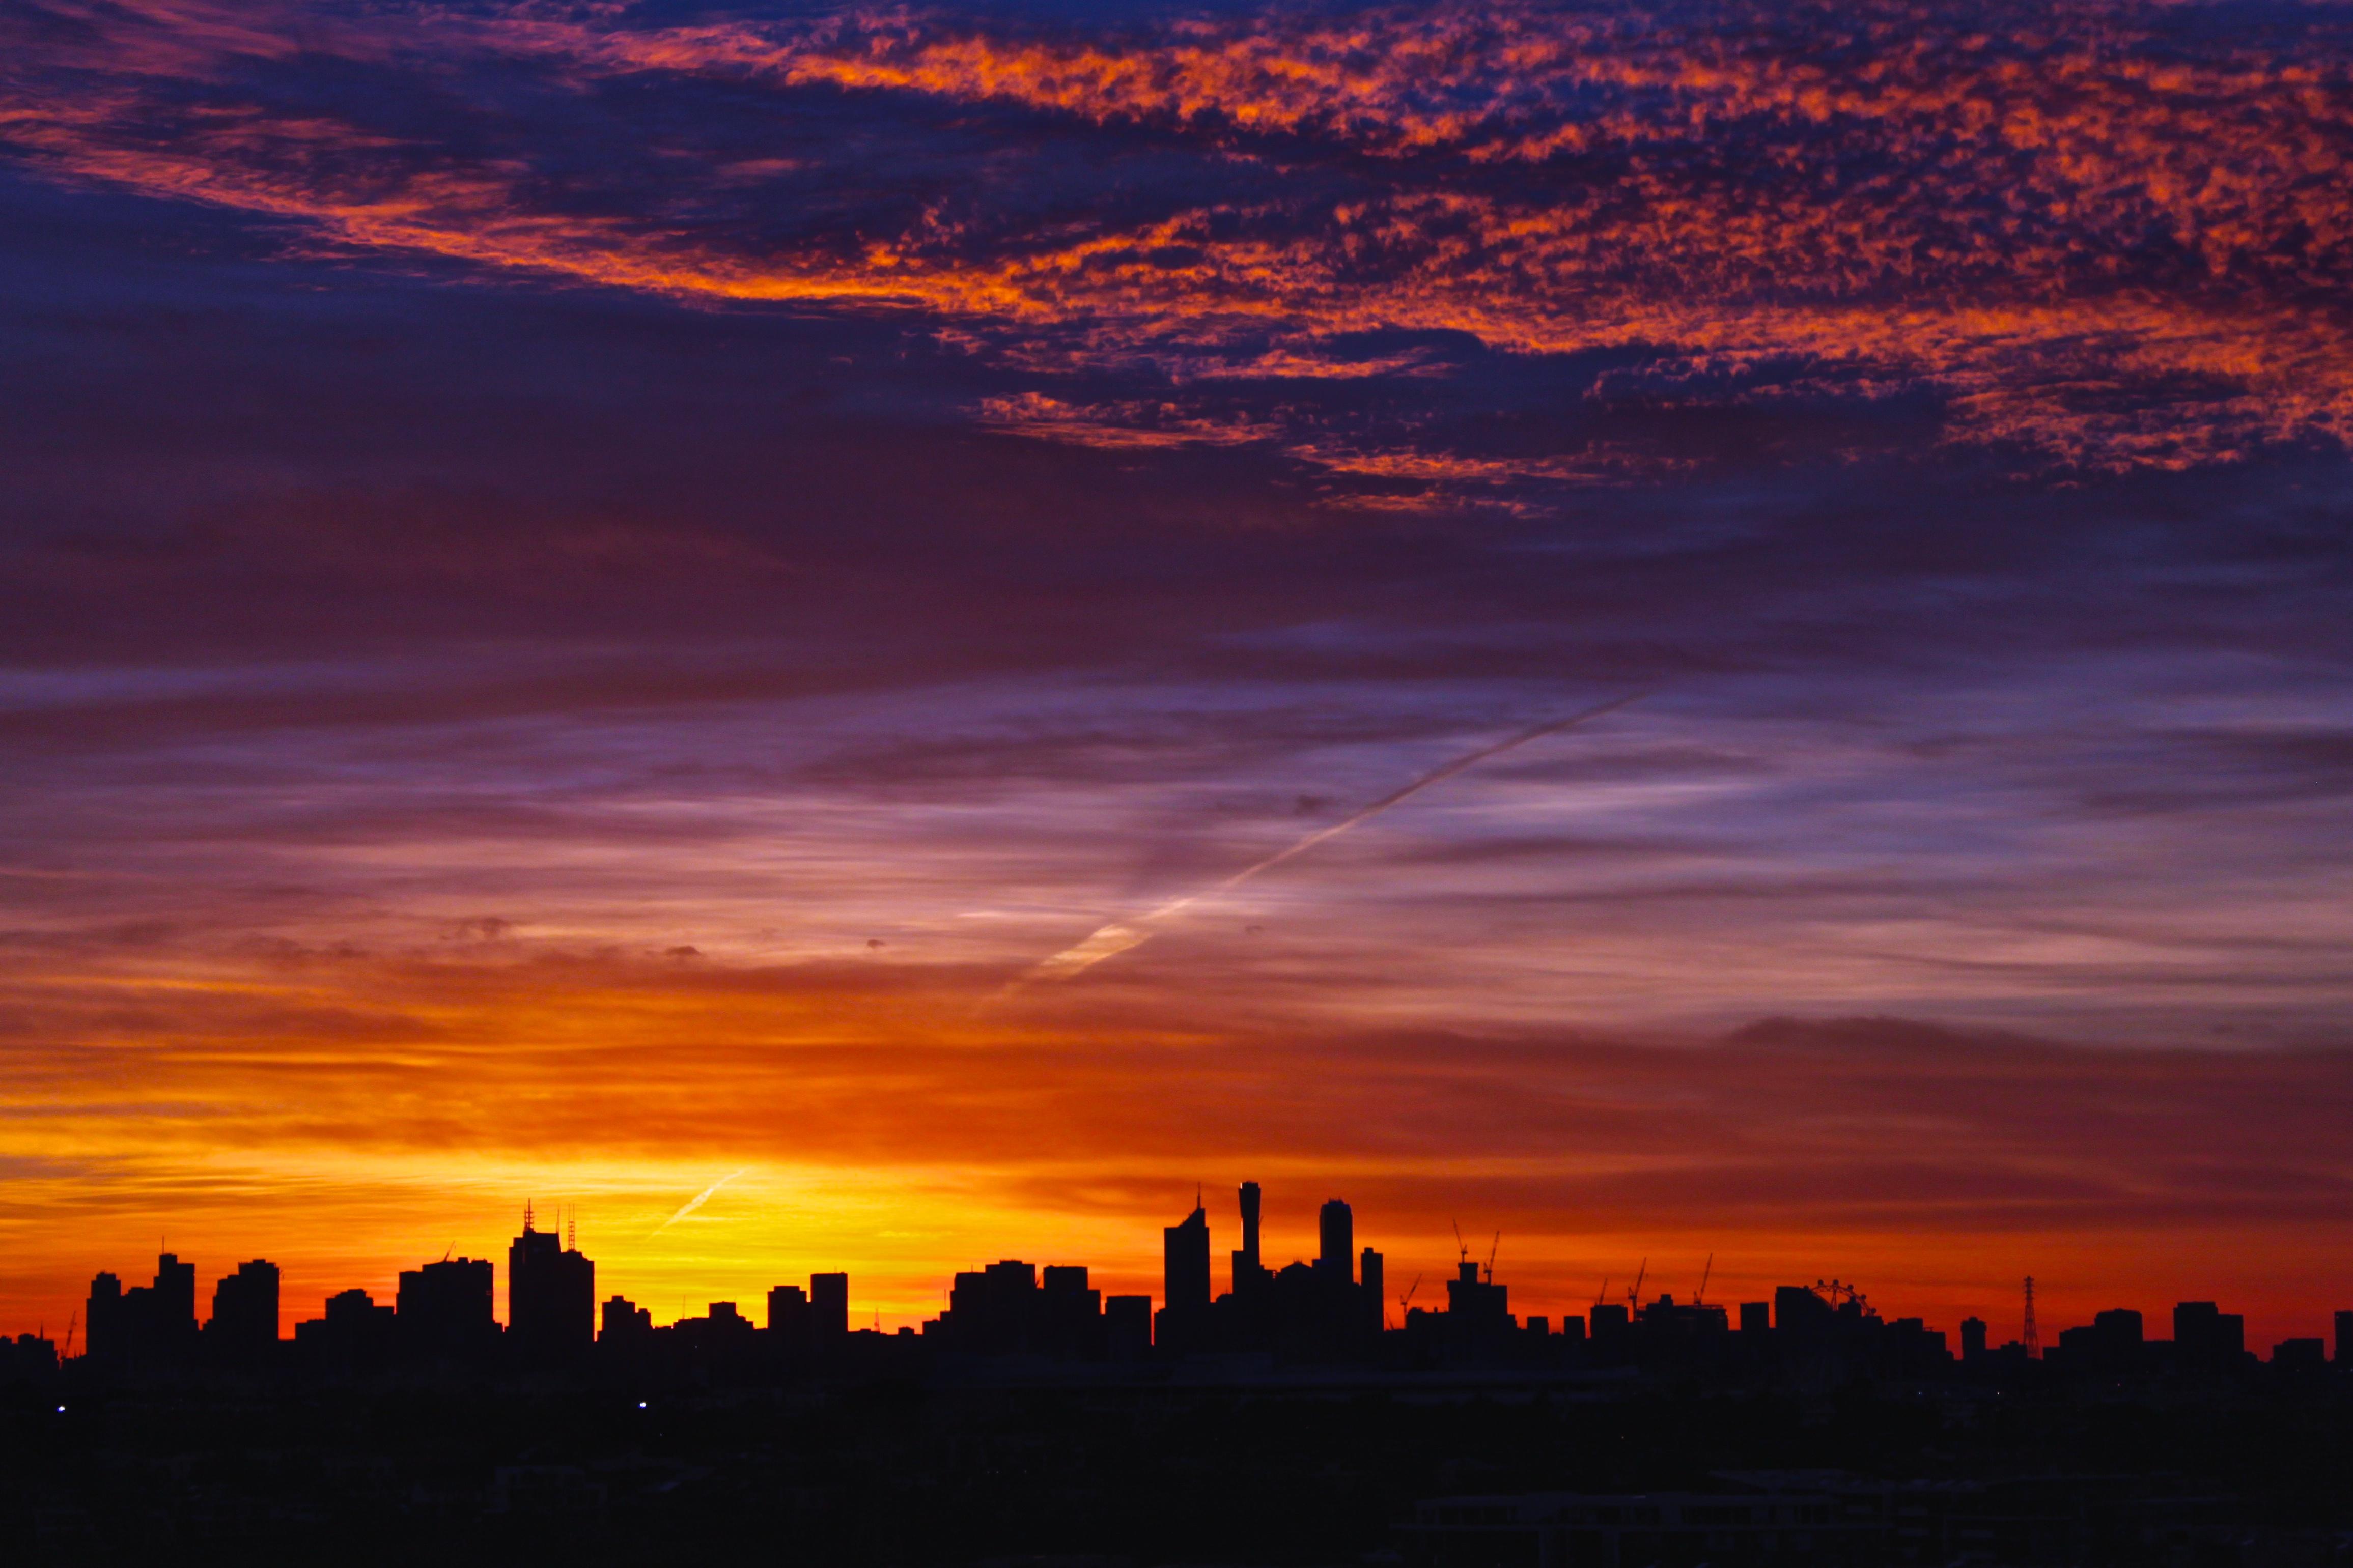 Australia Summer Work Travel Pilot Program Intrax